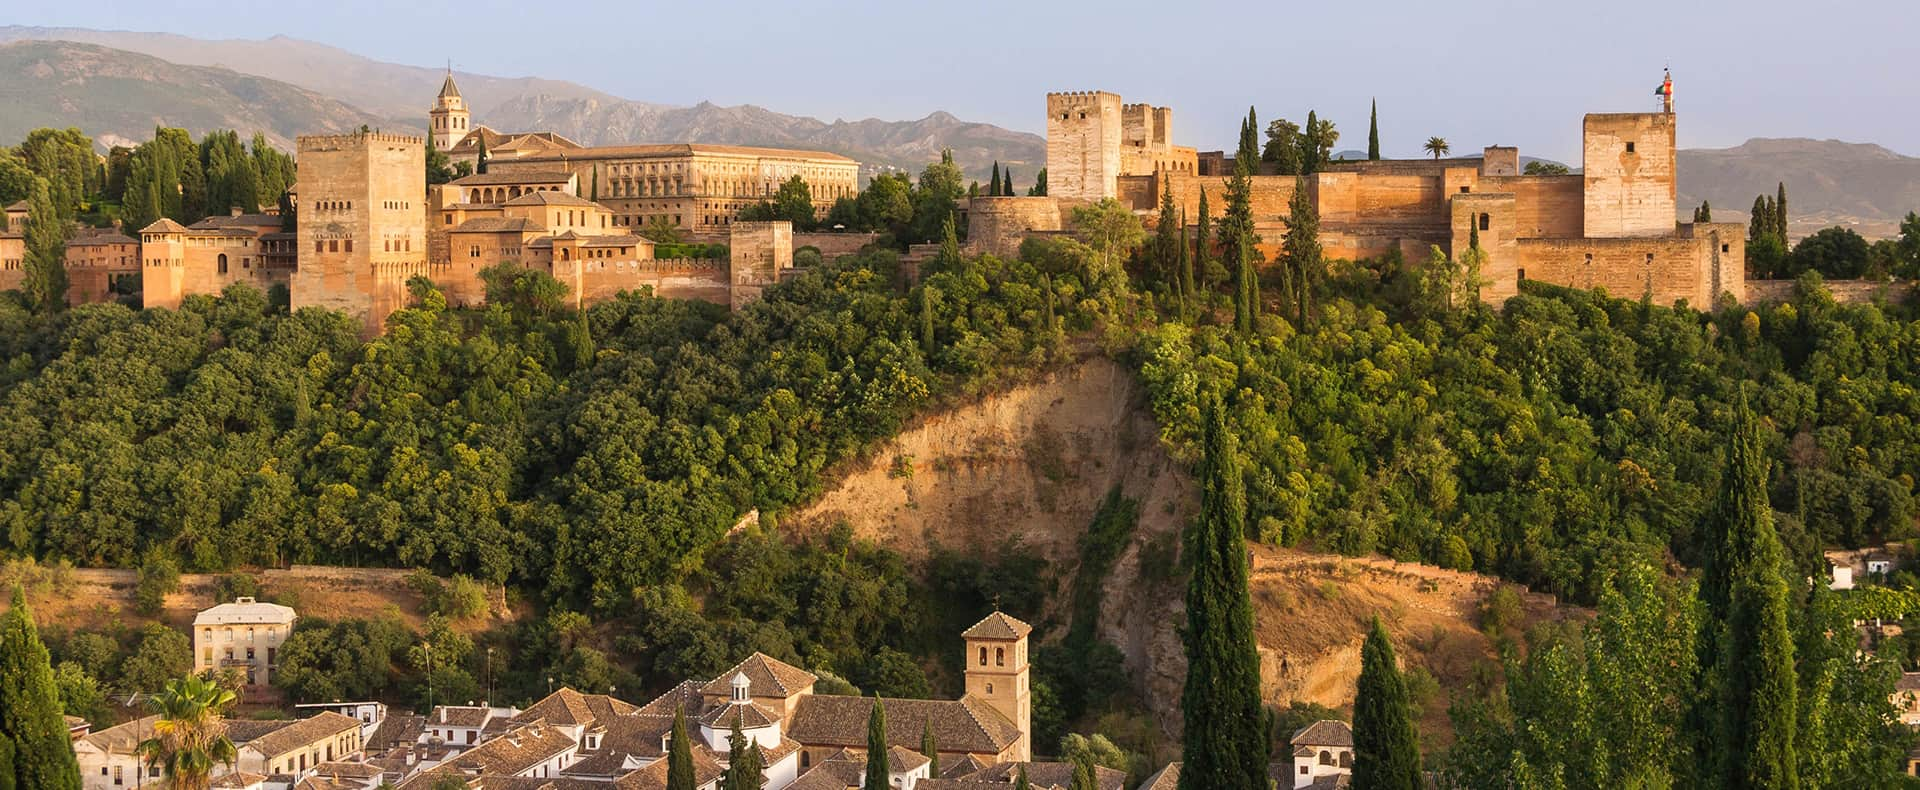 Alhambra Fortress, Granada, Spain